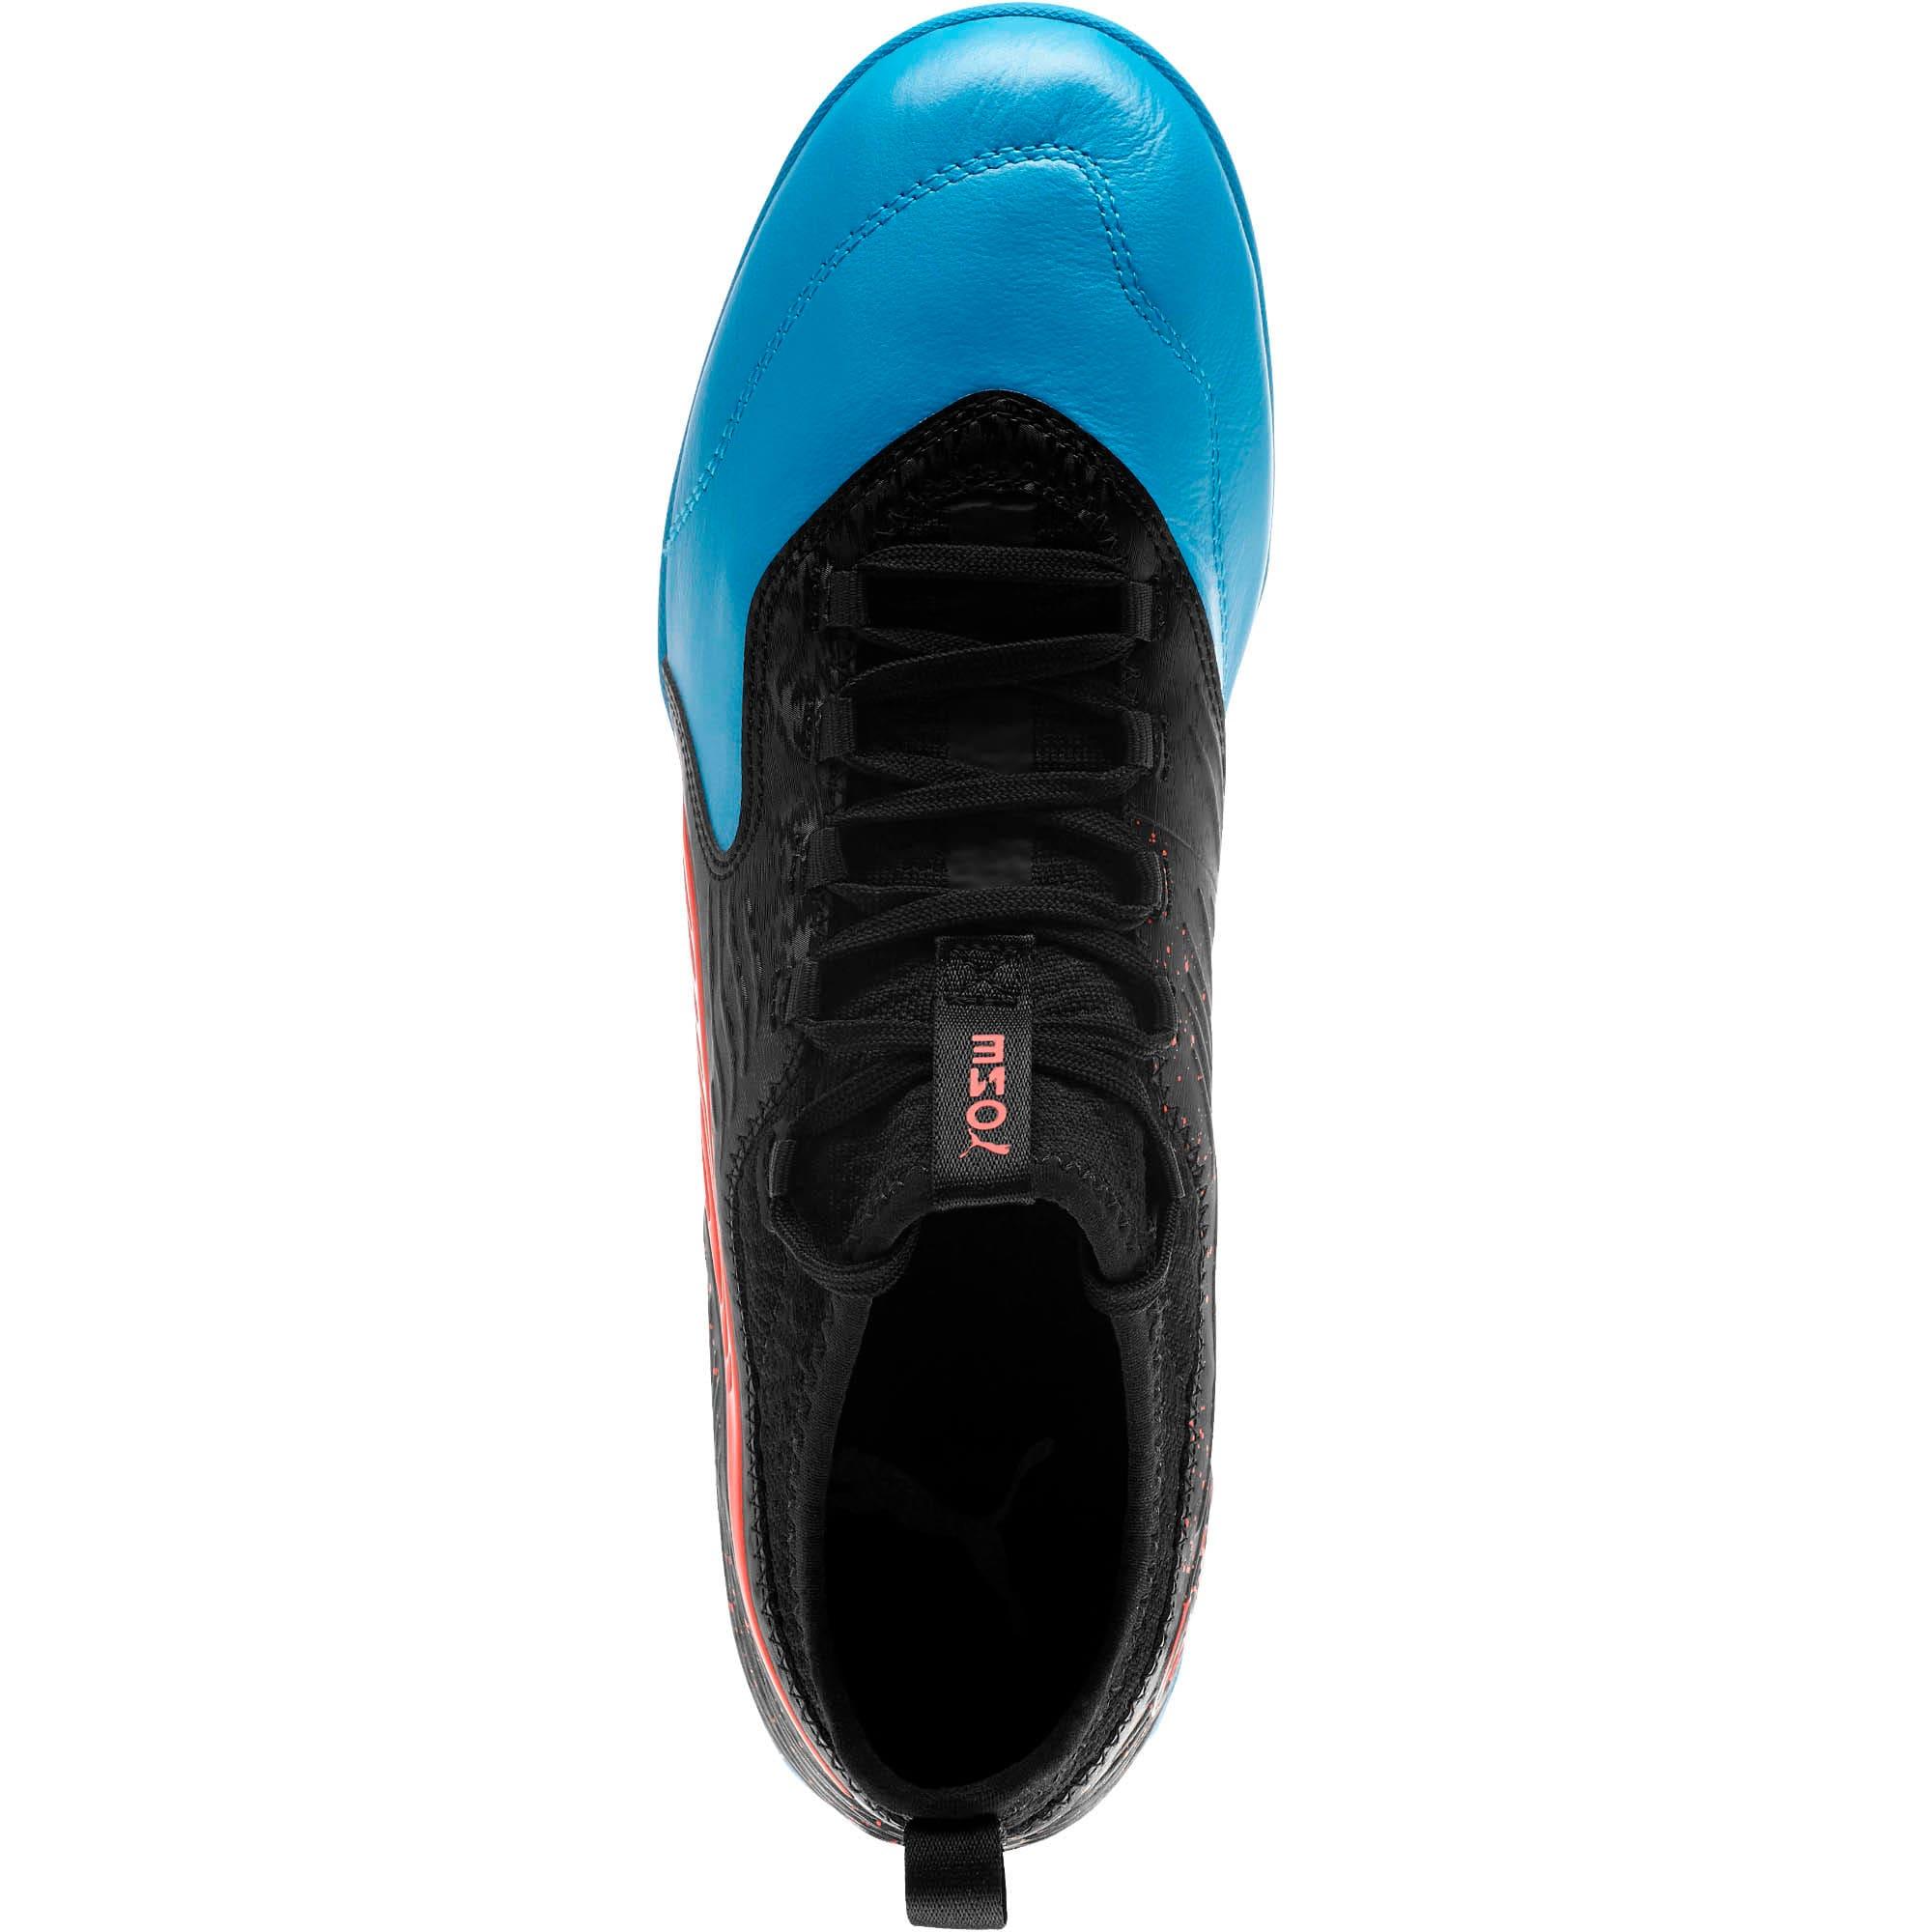 Thumbnail 5 of PUMA ONE 19.3 IT Men's Soccer Shoes, Bleu Azur-Red Blast-Black, medium